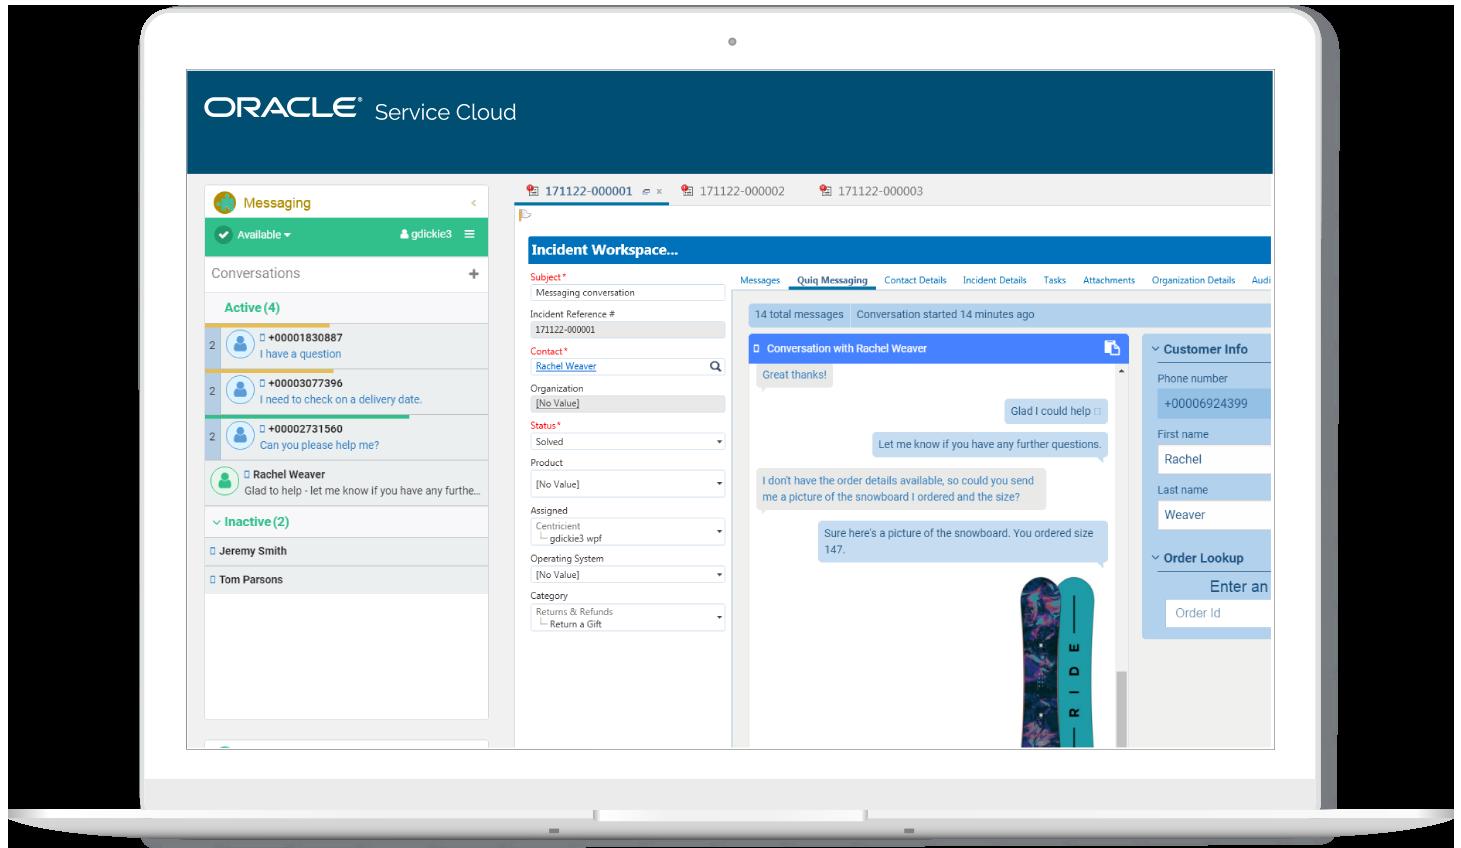 screenshot of Oracle service cloud on a Mac computer